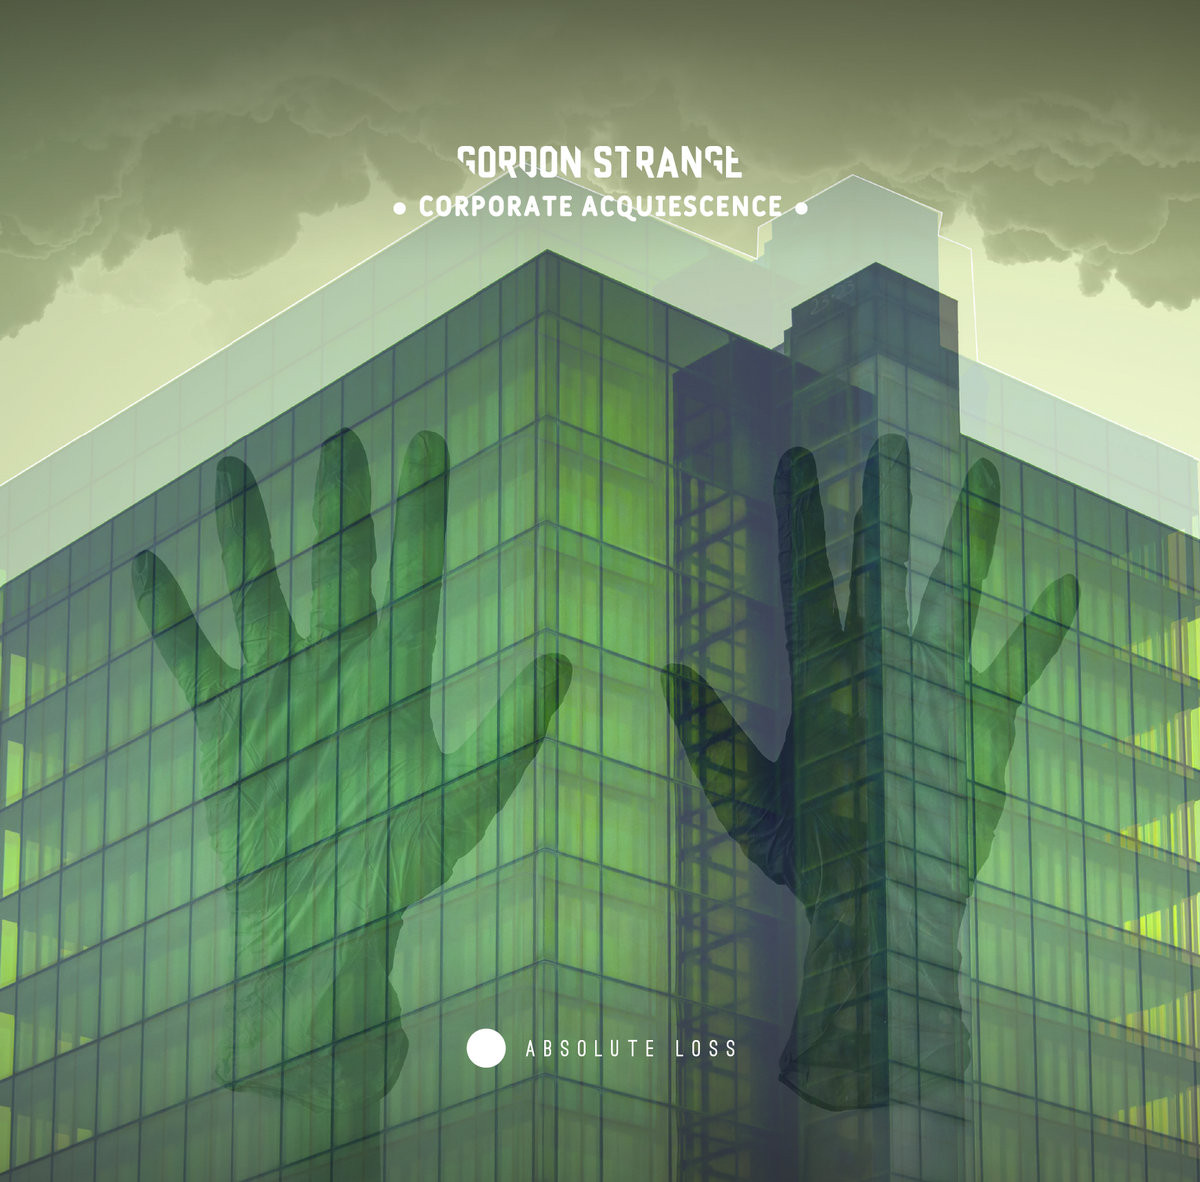 Gordon Strange - Corporate Acquiescence